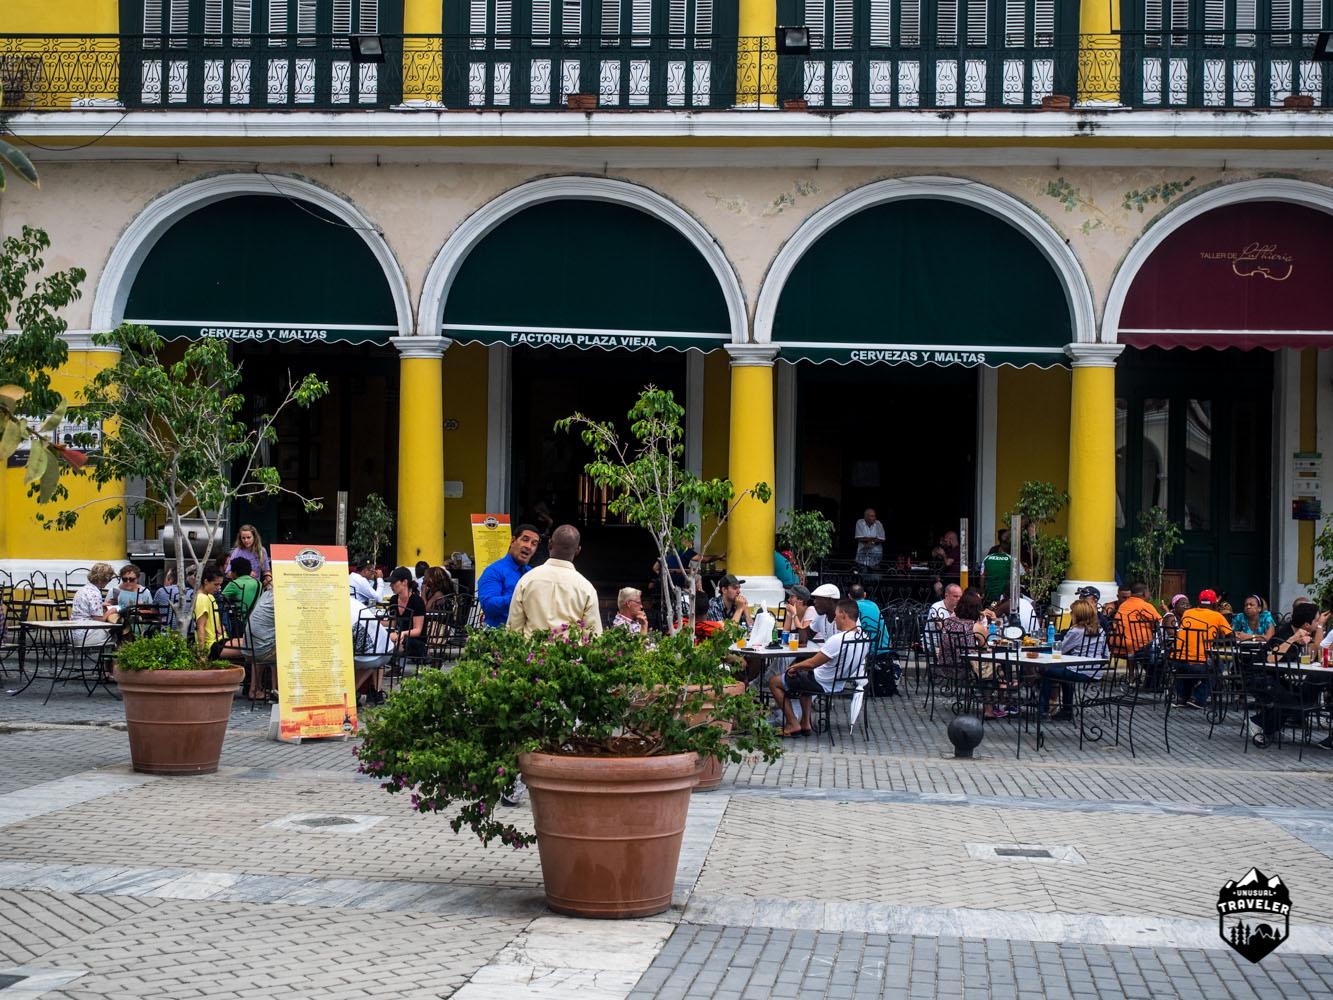 The outside area at Factoria Plaza Vieja.